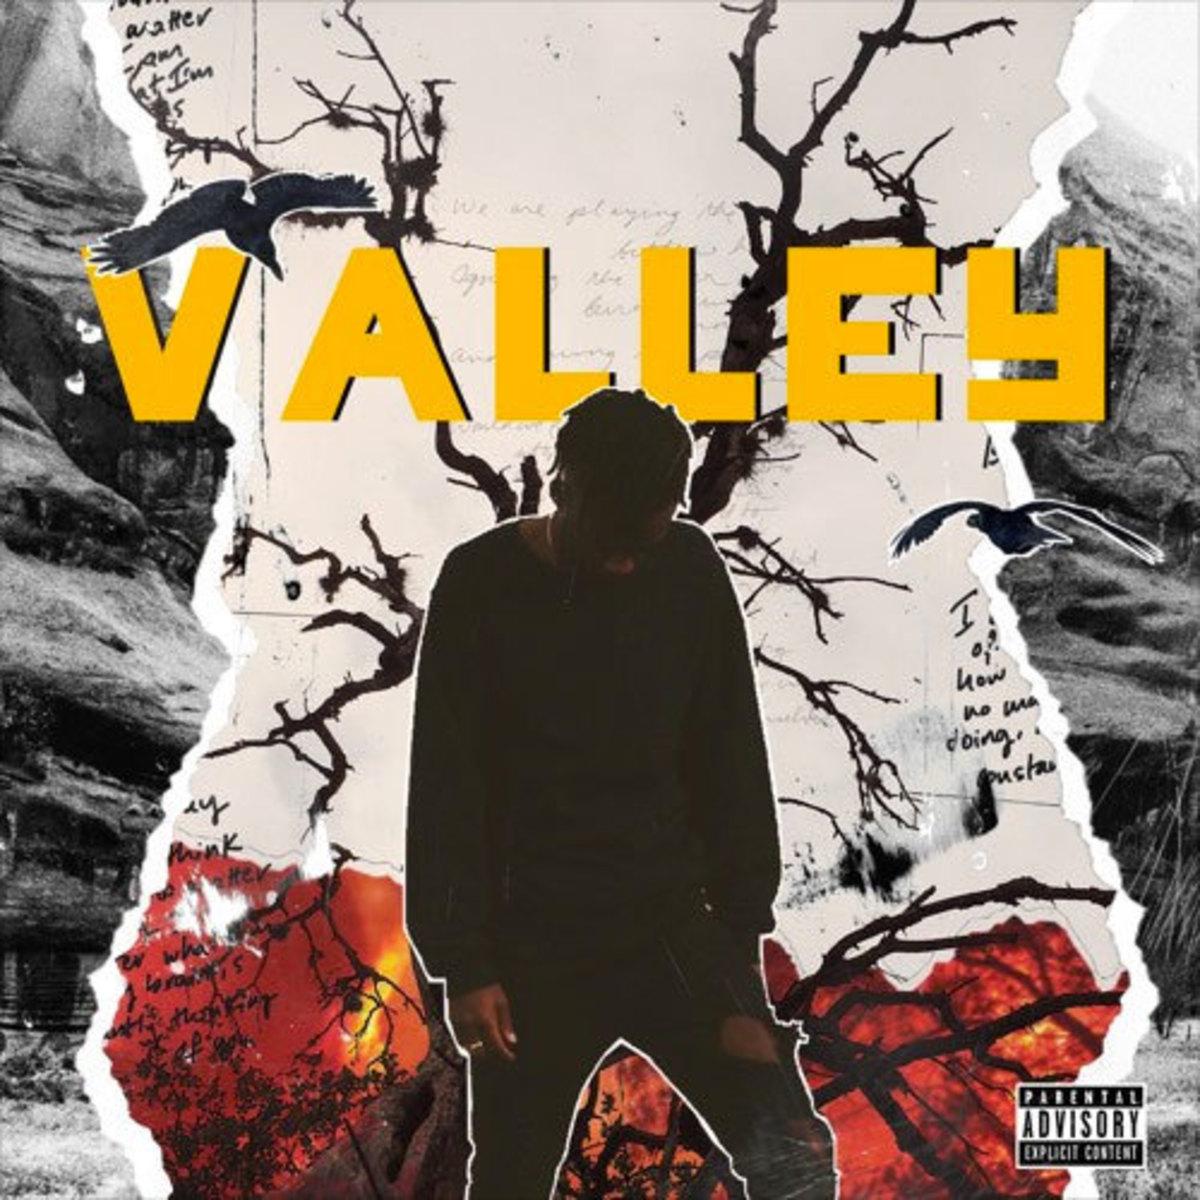 proz-taylor-valley.jpg